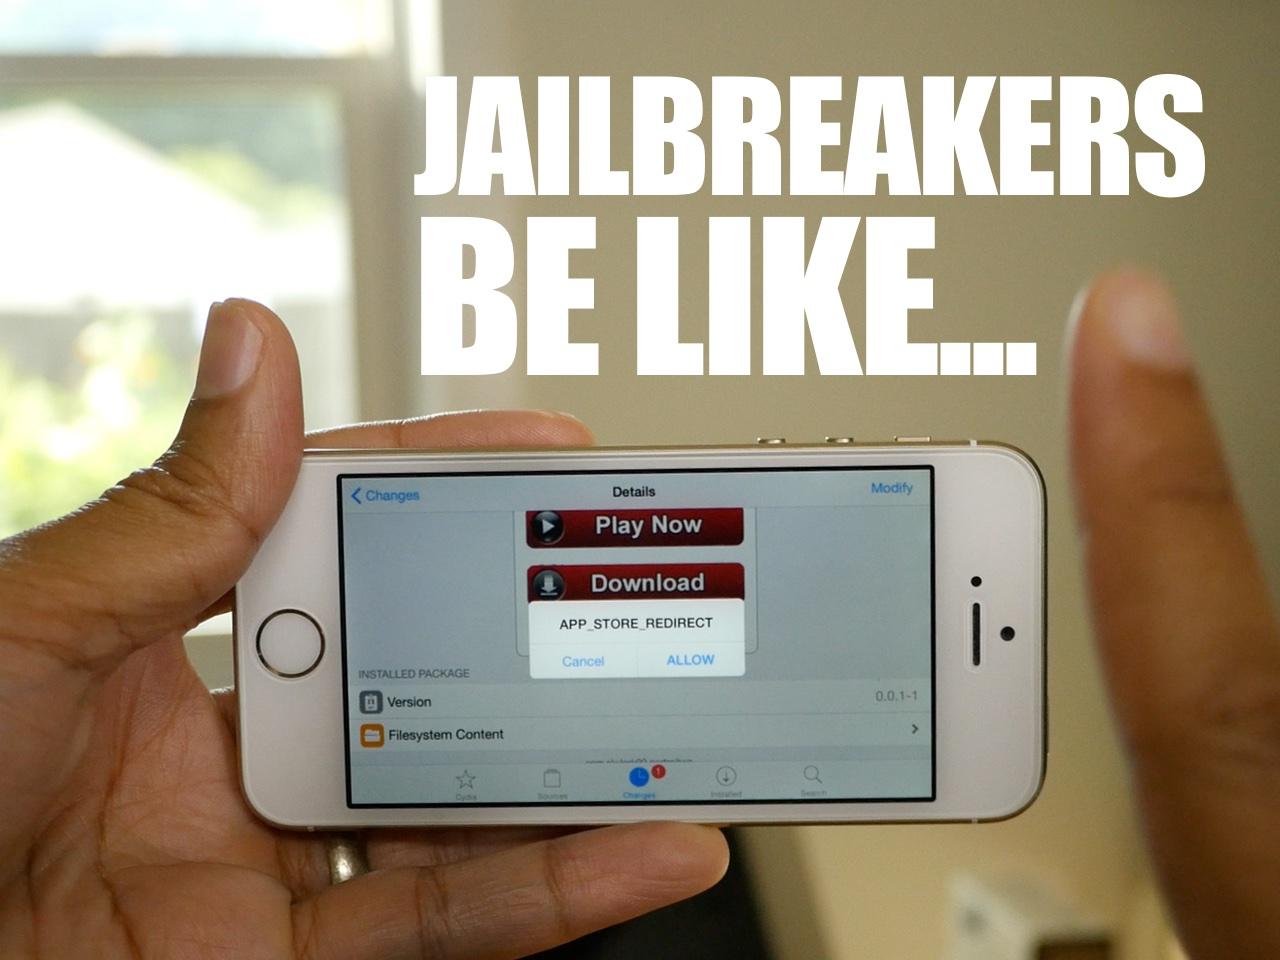 Jailbreakers Be Like 3